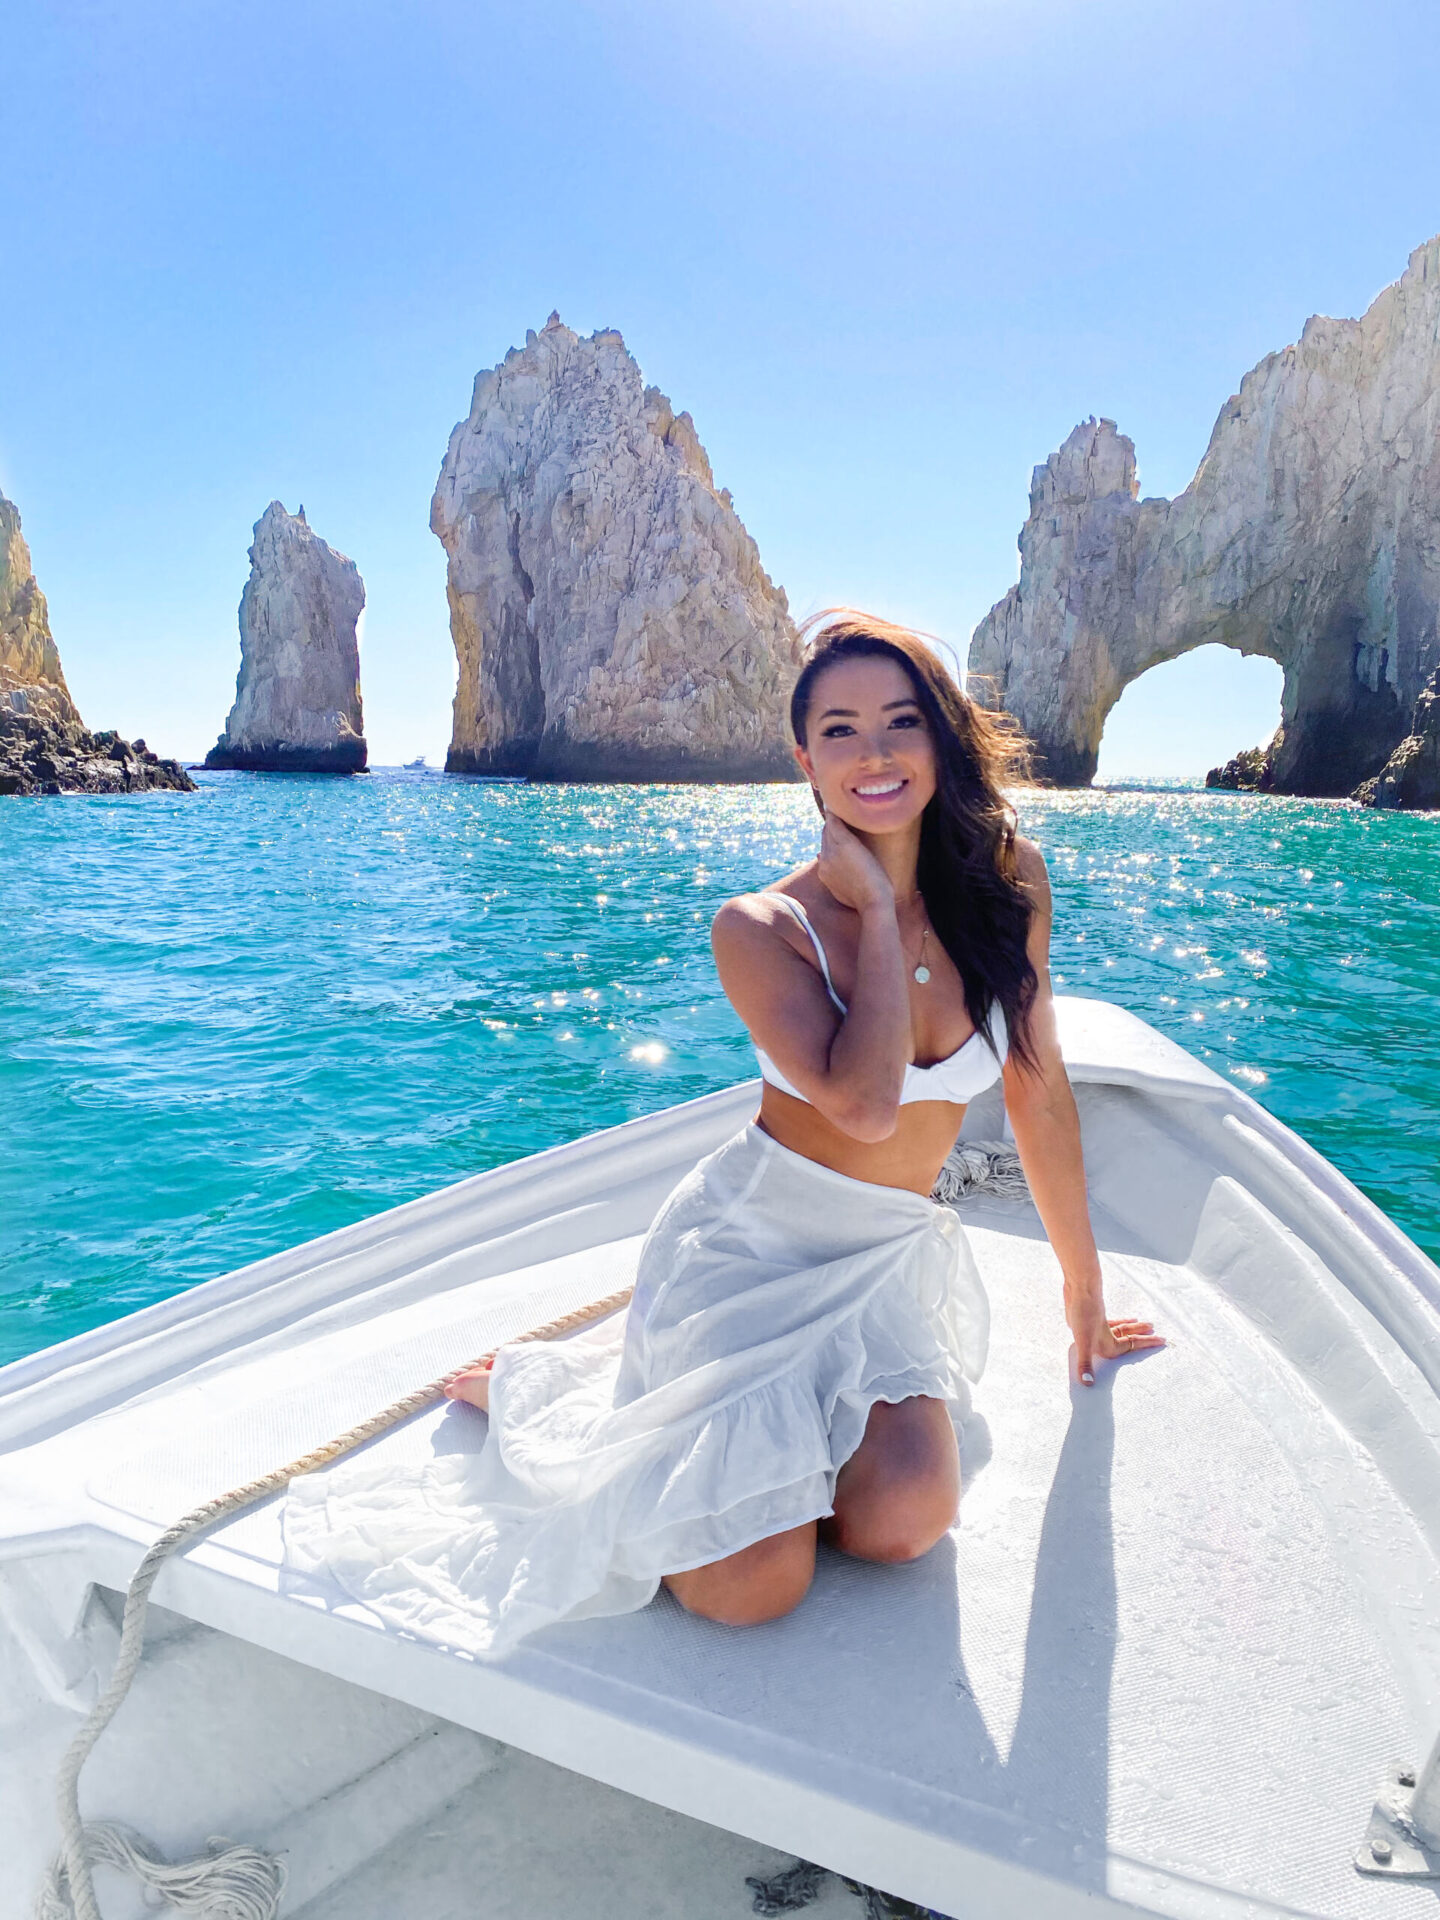 cabo, water taxi, cabo arch, ocean, mexico, travel